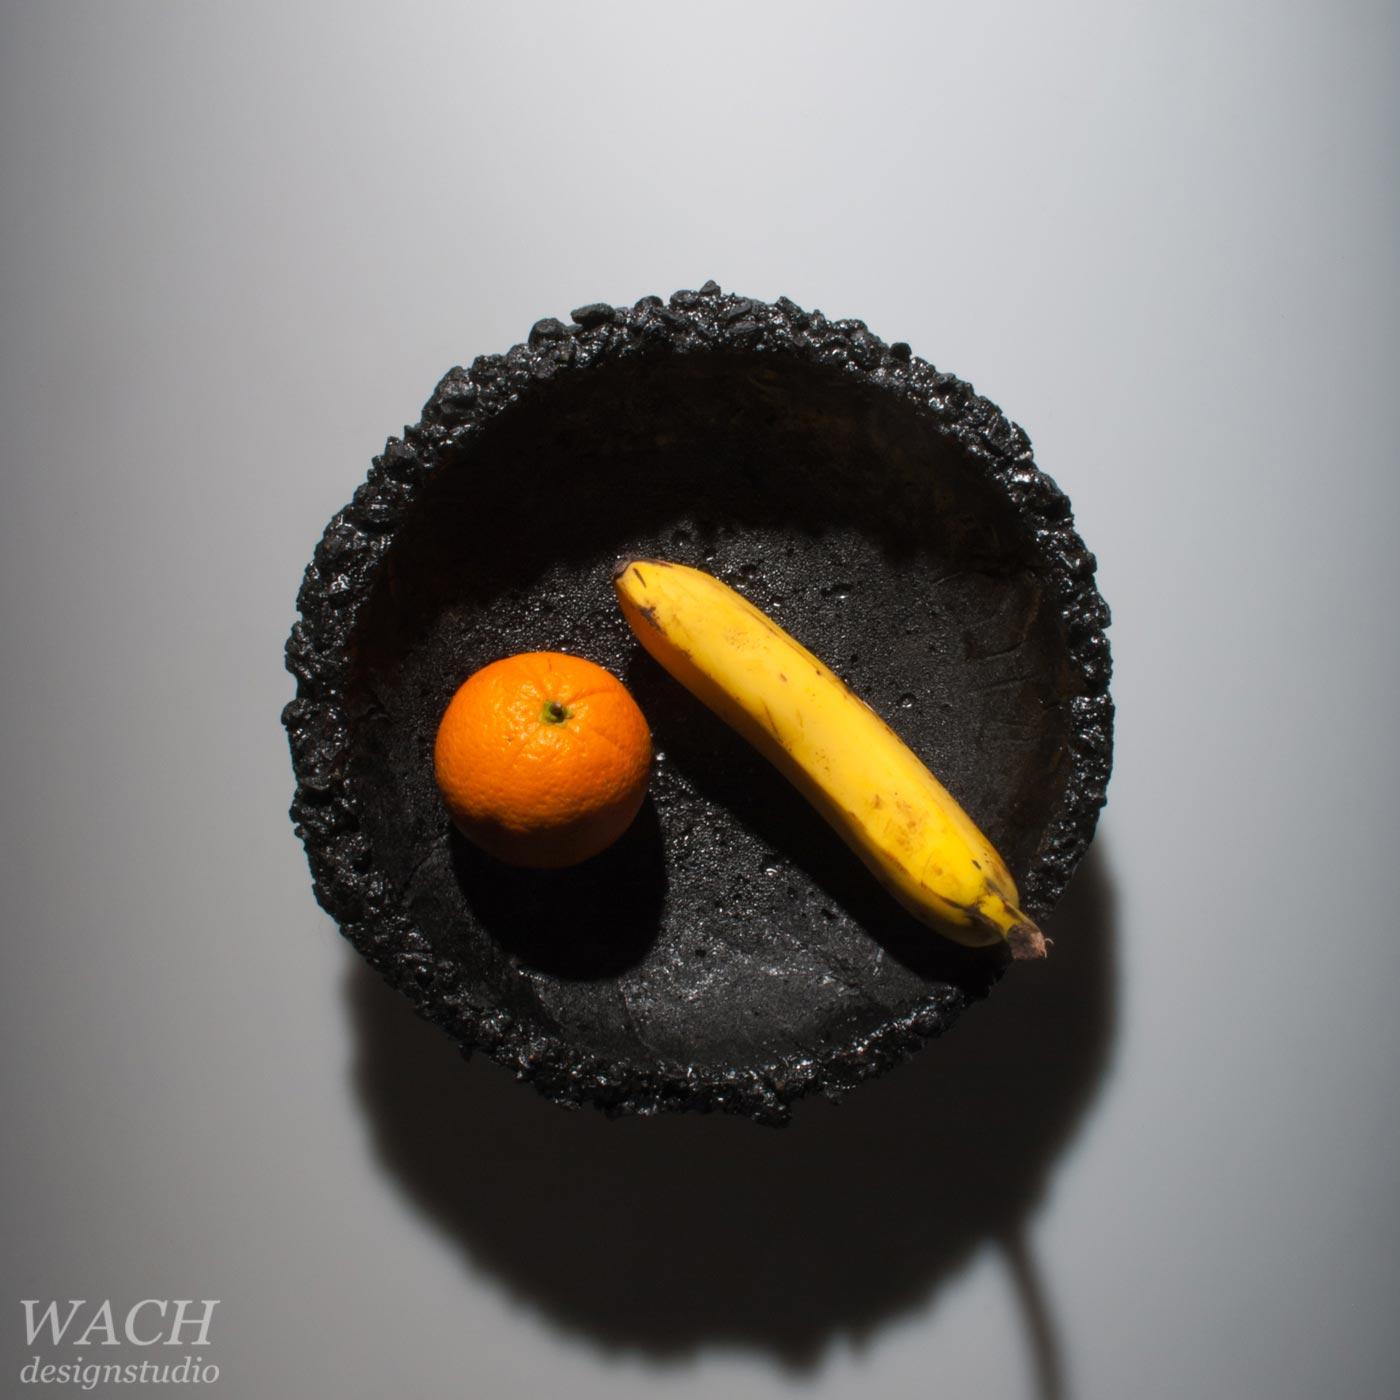 Experimental Asphalt Bowl by WACH designstudio